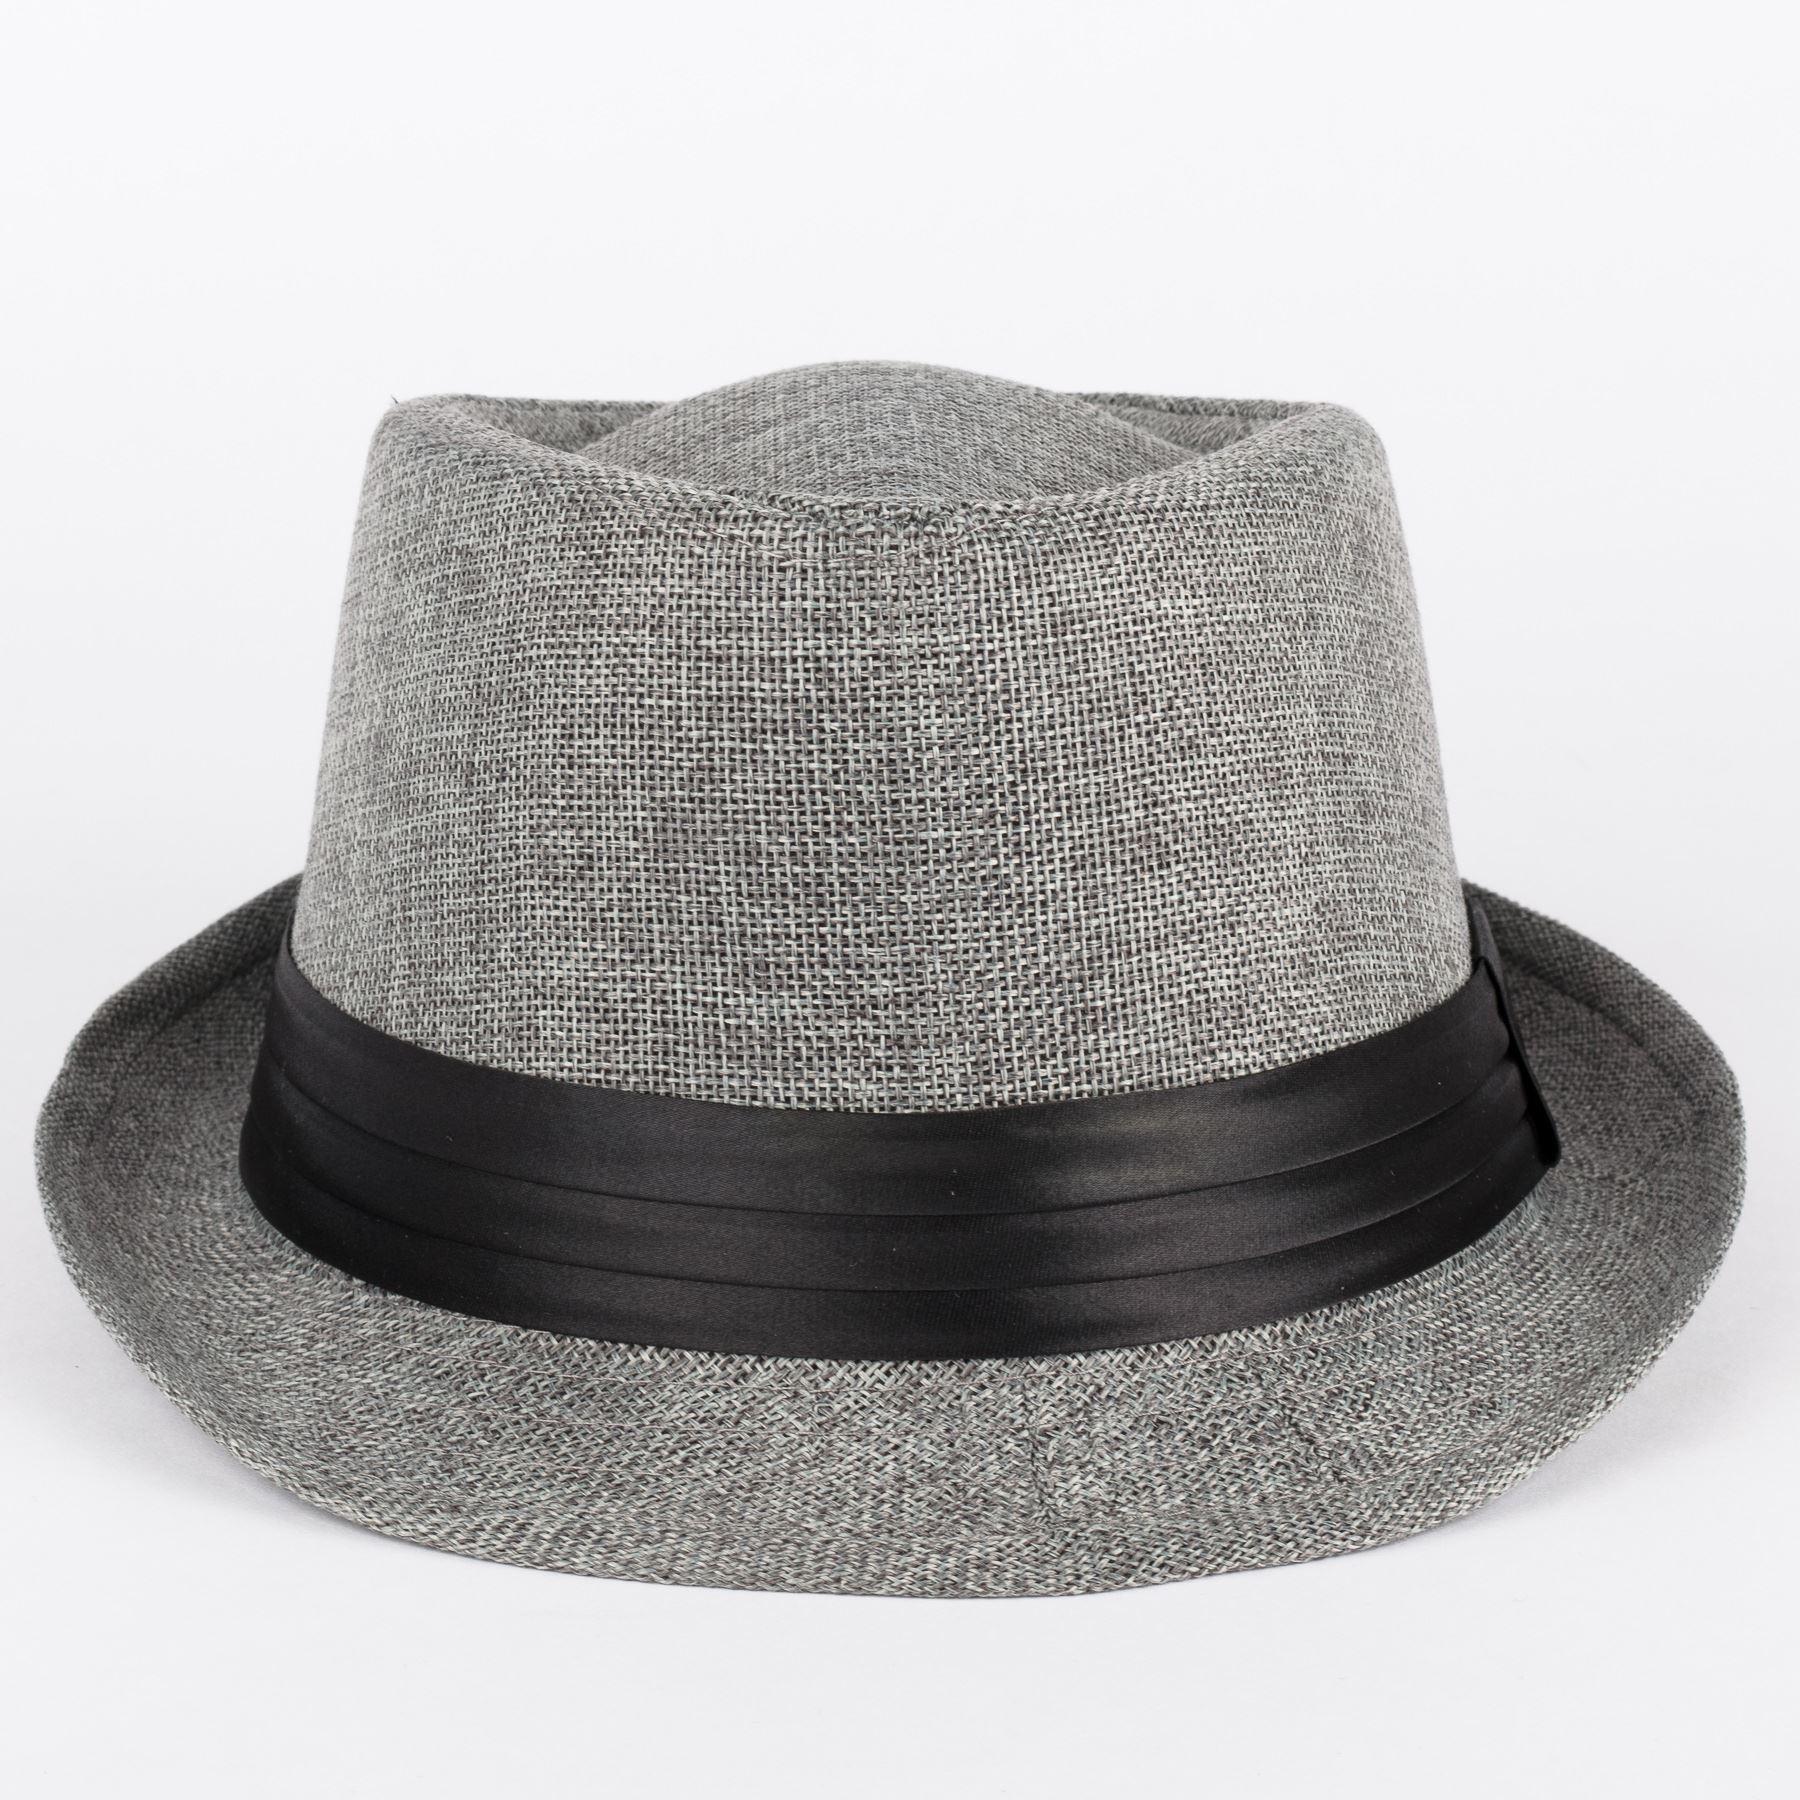 Chapeau-En-Feutre-Avec-Ruban-Noir-En-Satin